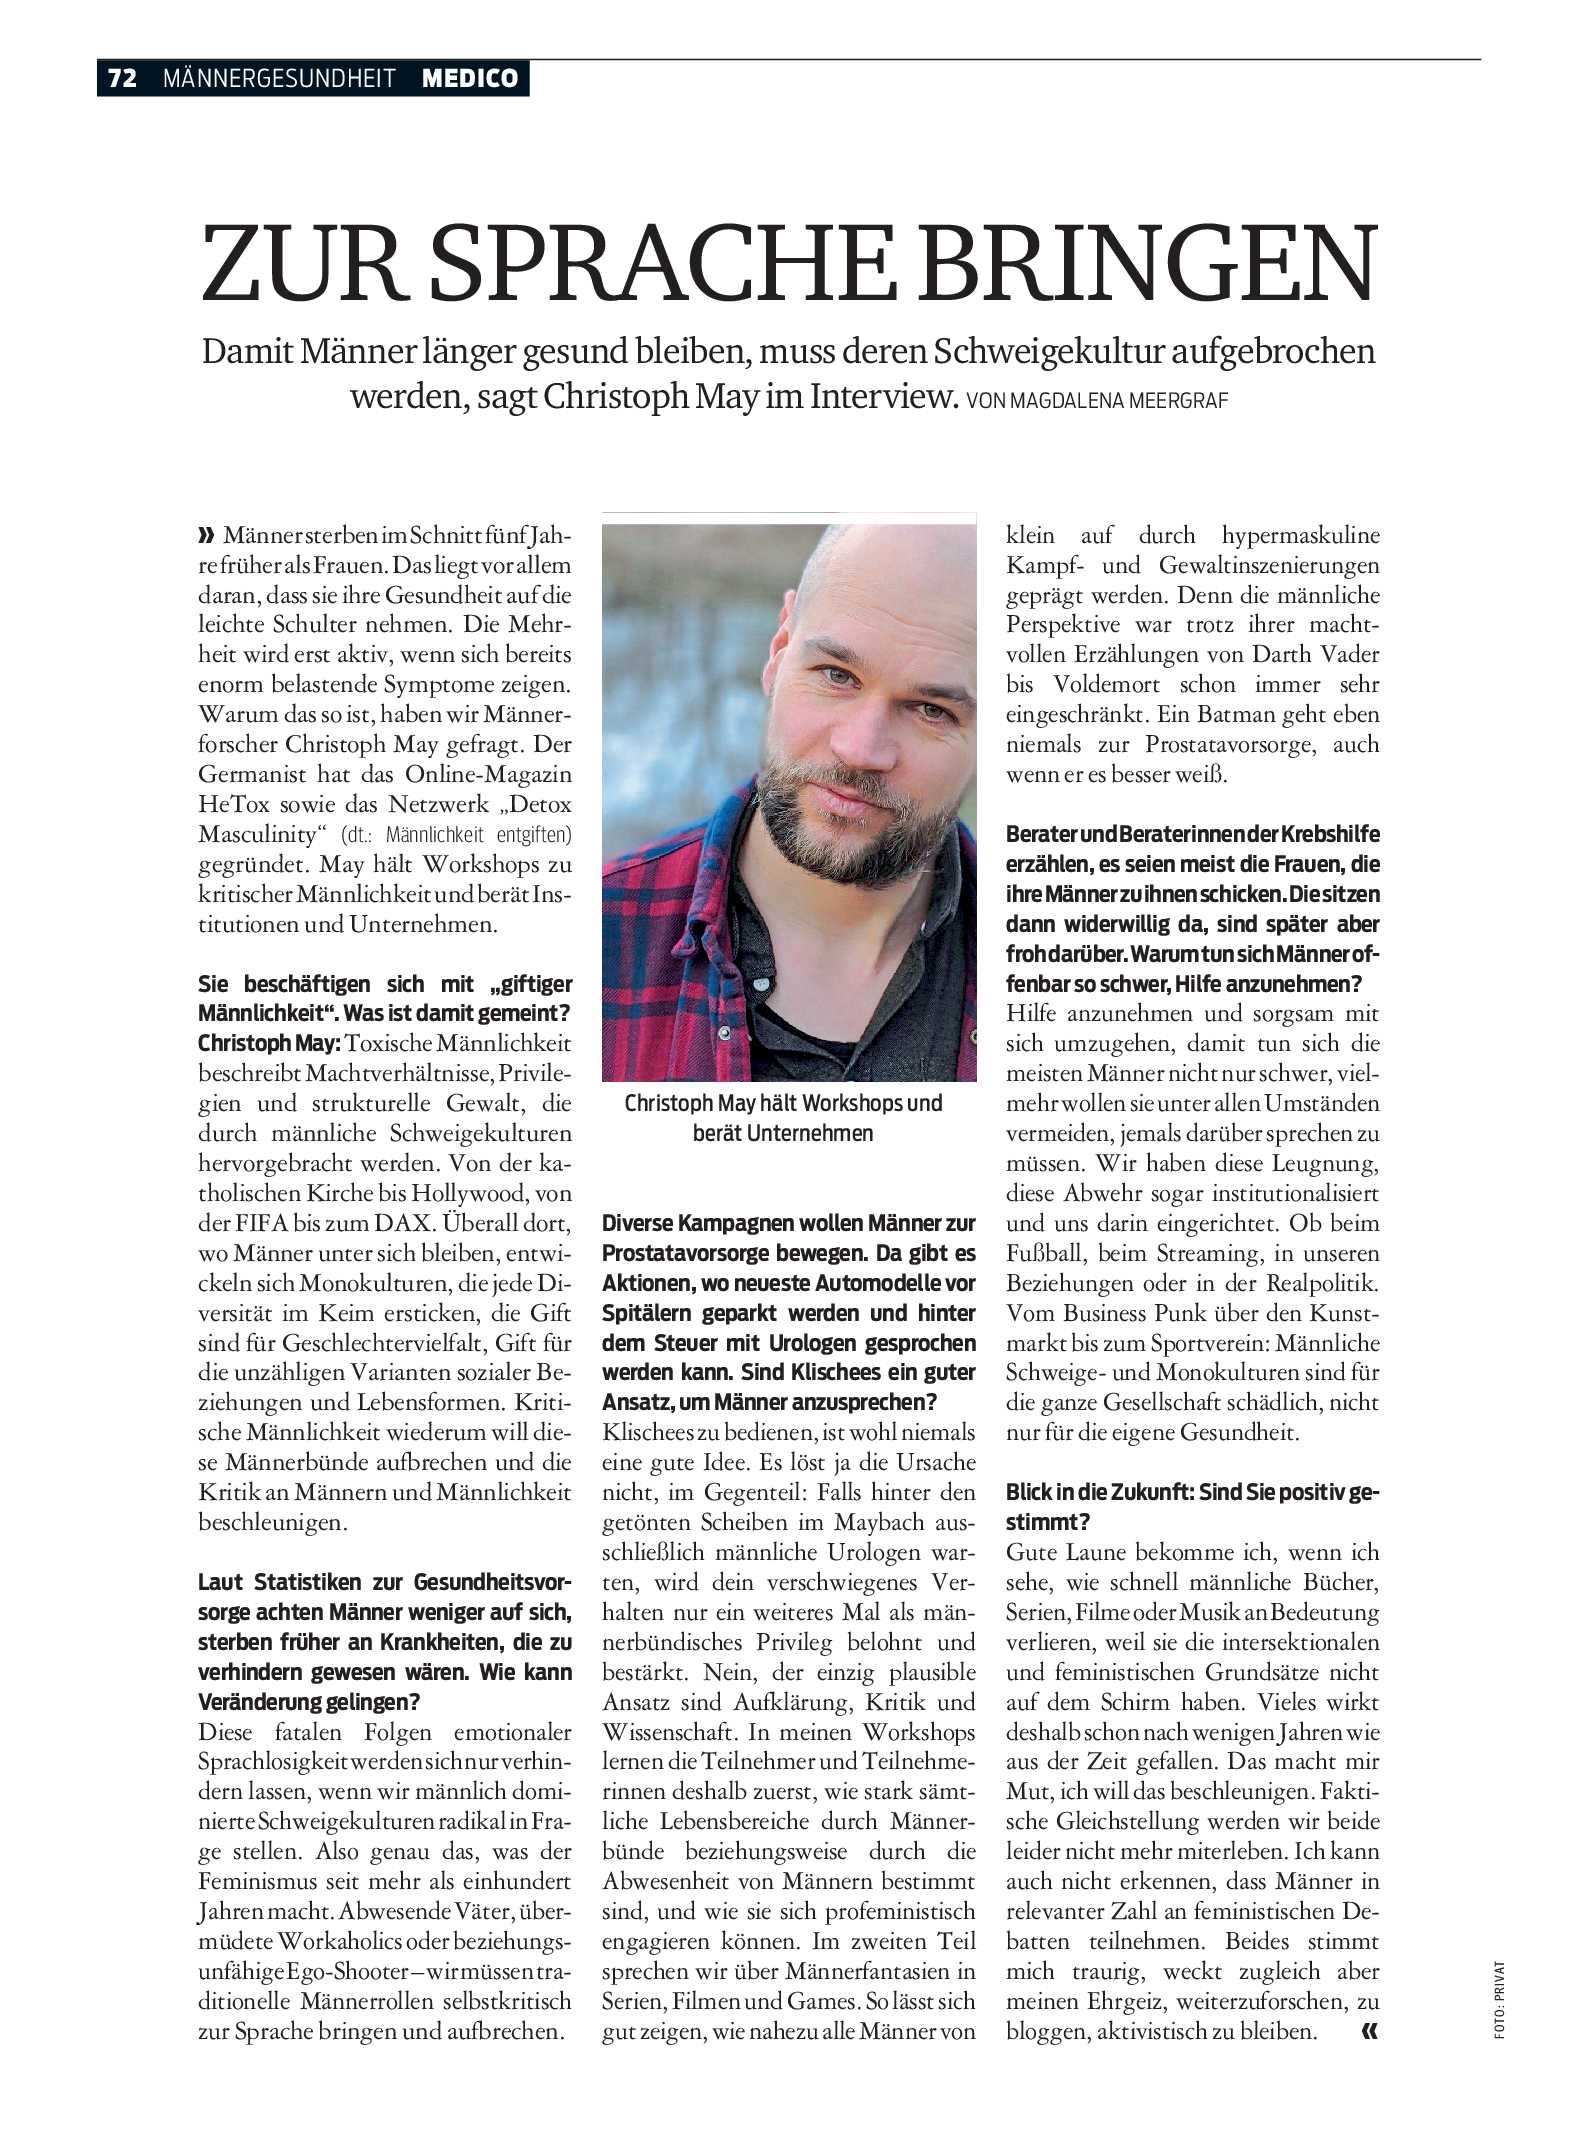 public/epaper/imported/20201125/kurier/magazin/magazin_20201125_072.jpg